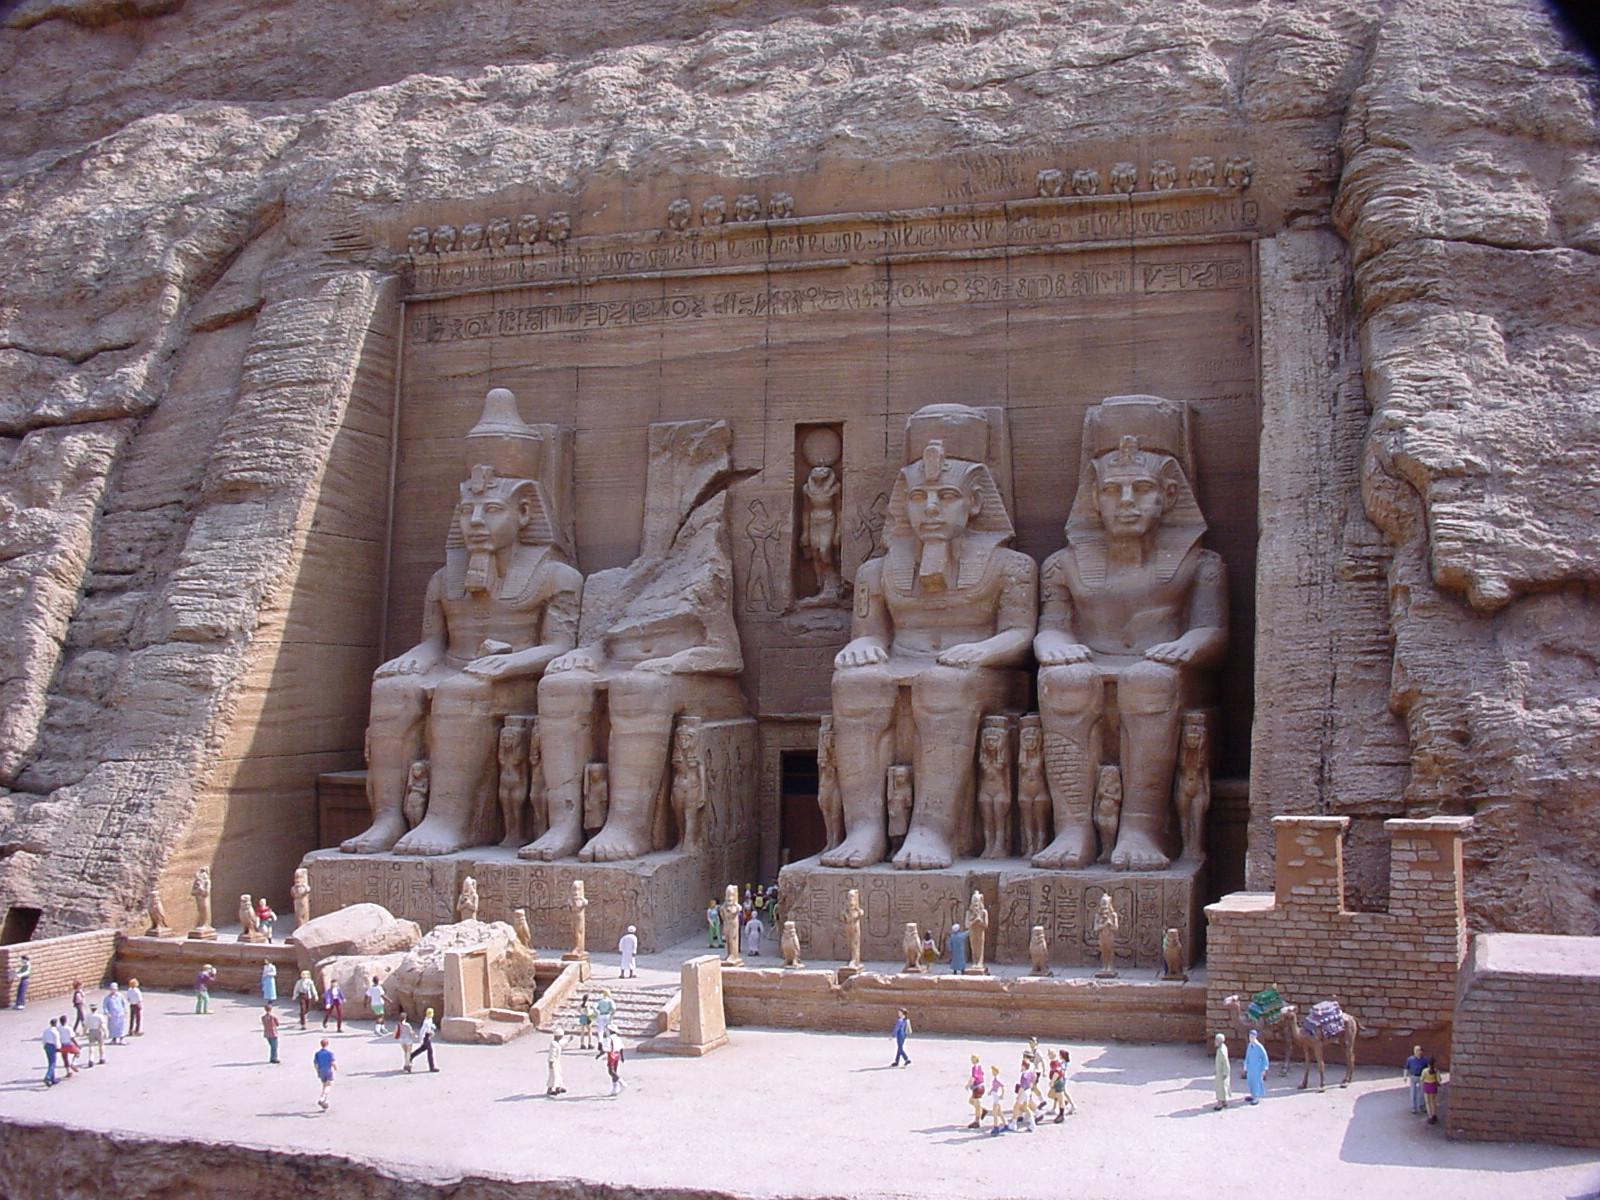 Tobu_World_Square_Great_Temple_of_Abu_Simbel_1.jpg